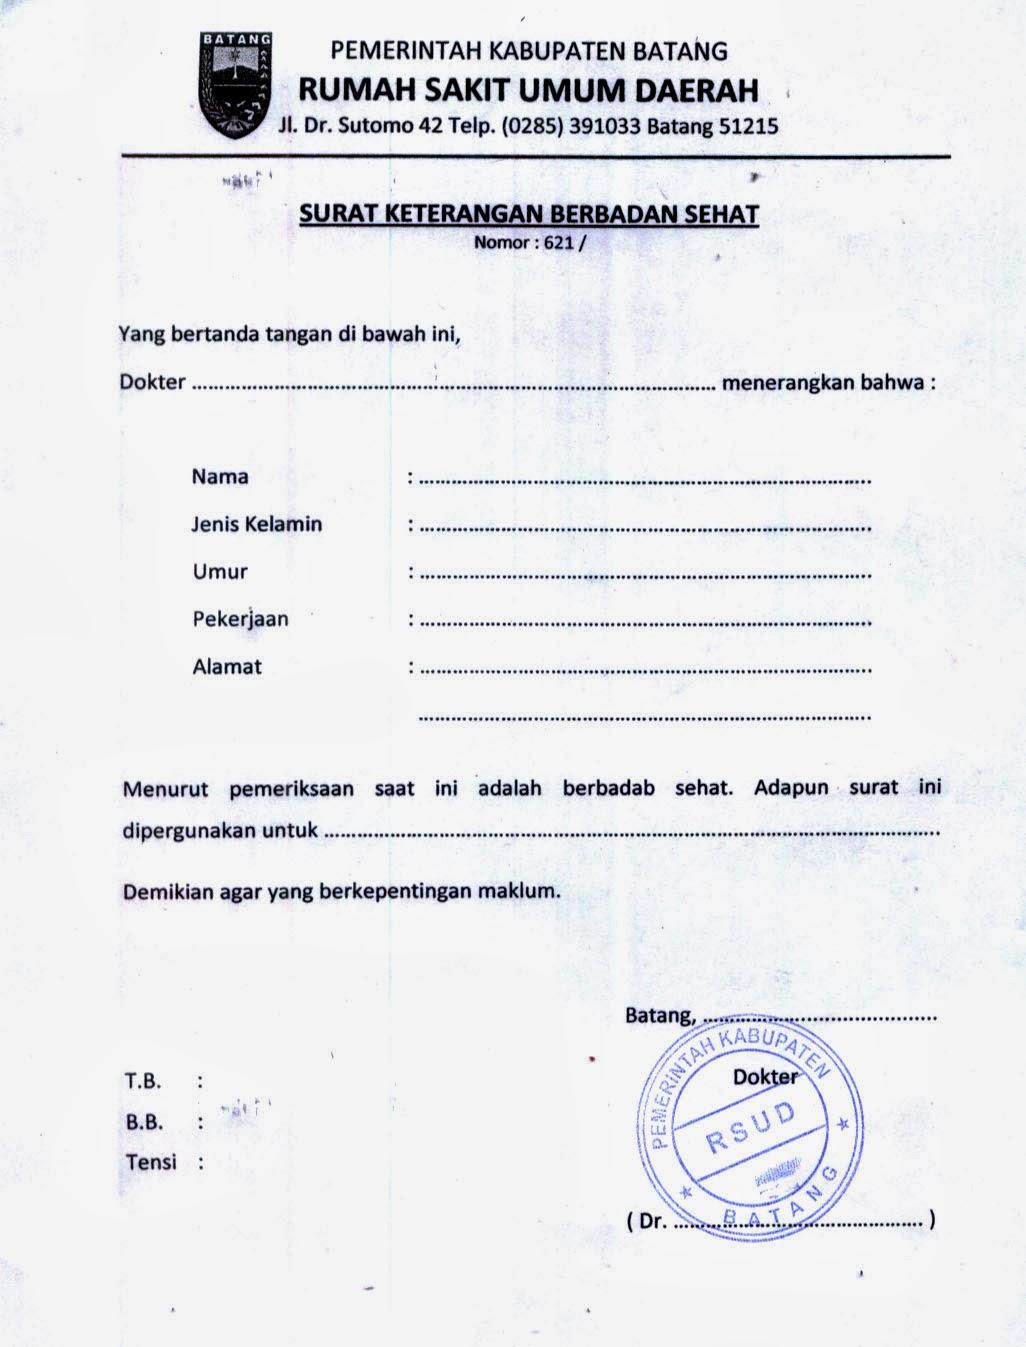 Contoh Surat Format Surat Surat Lamaran Contoh Proposal Contoh ...